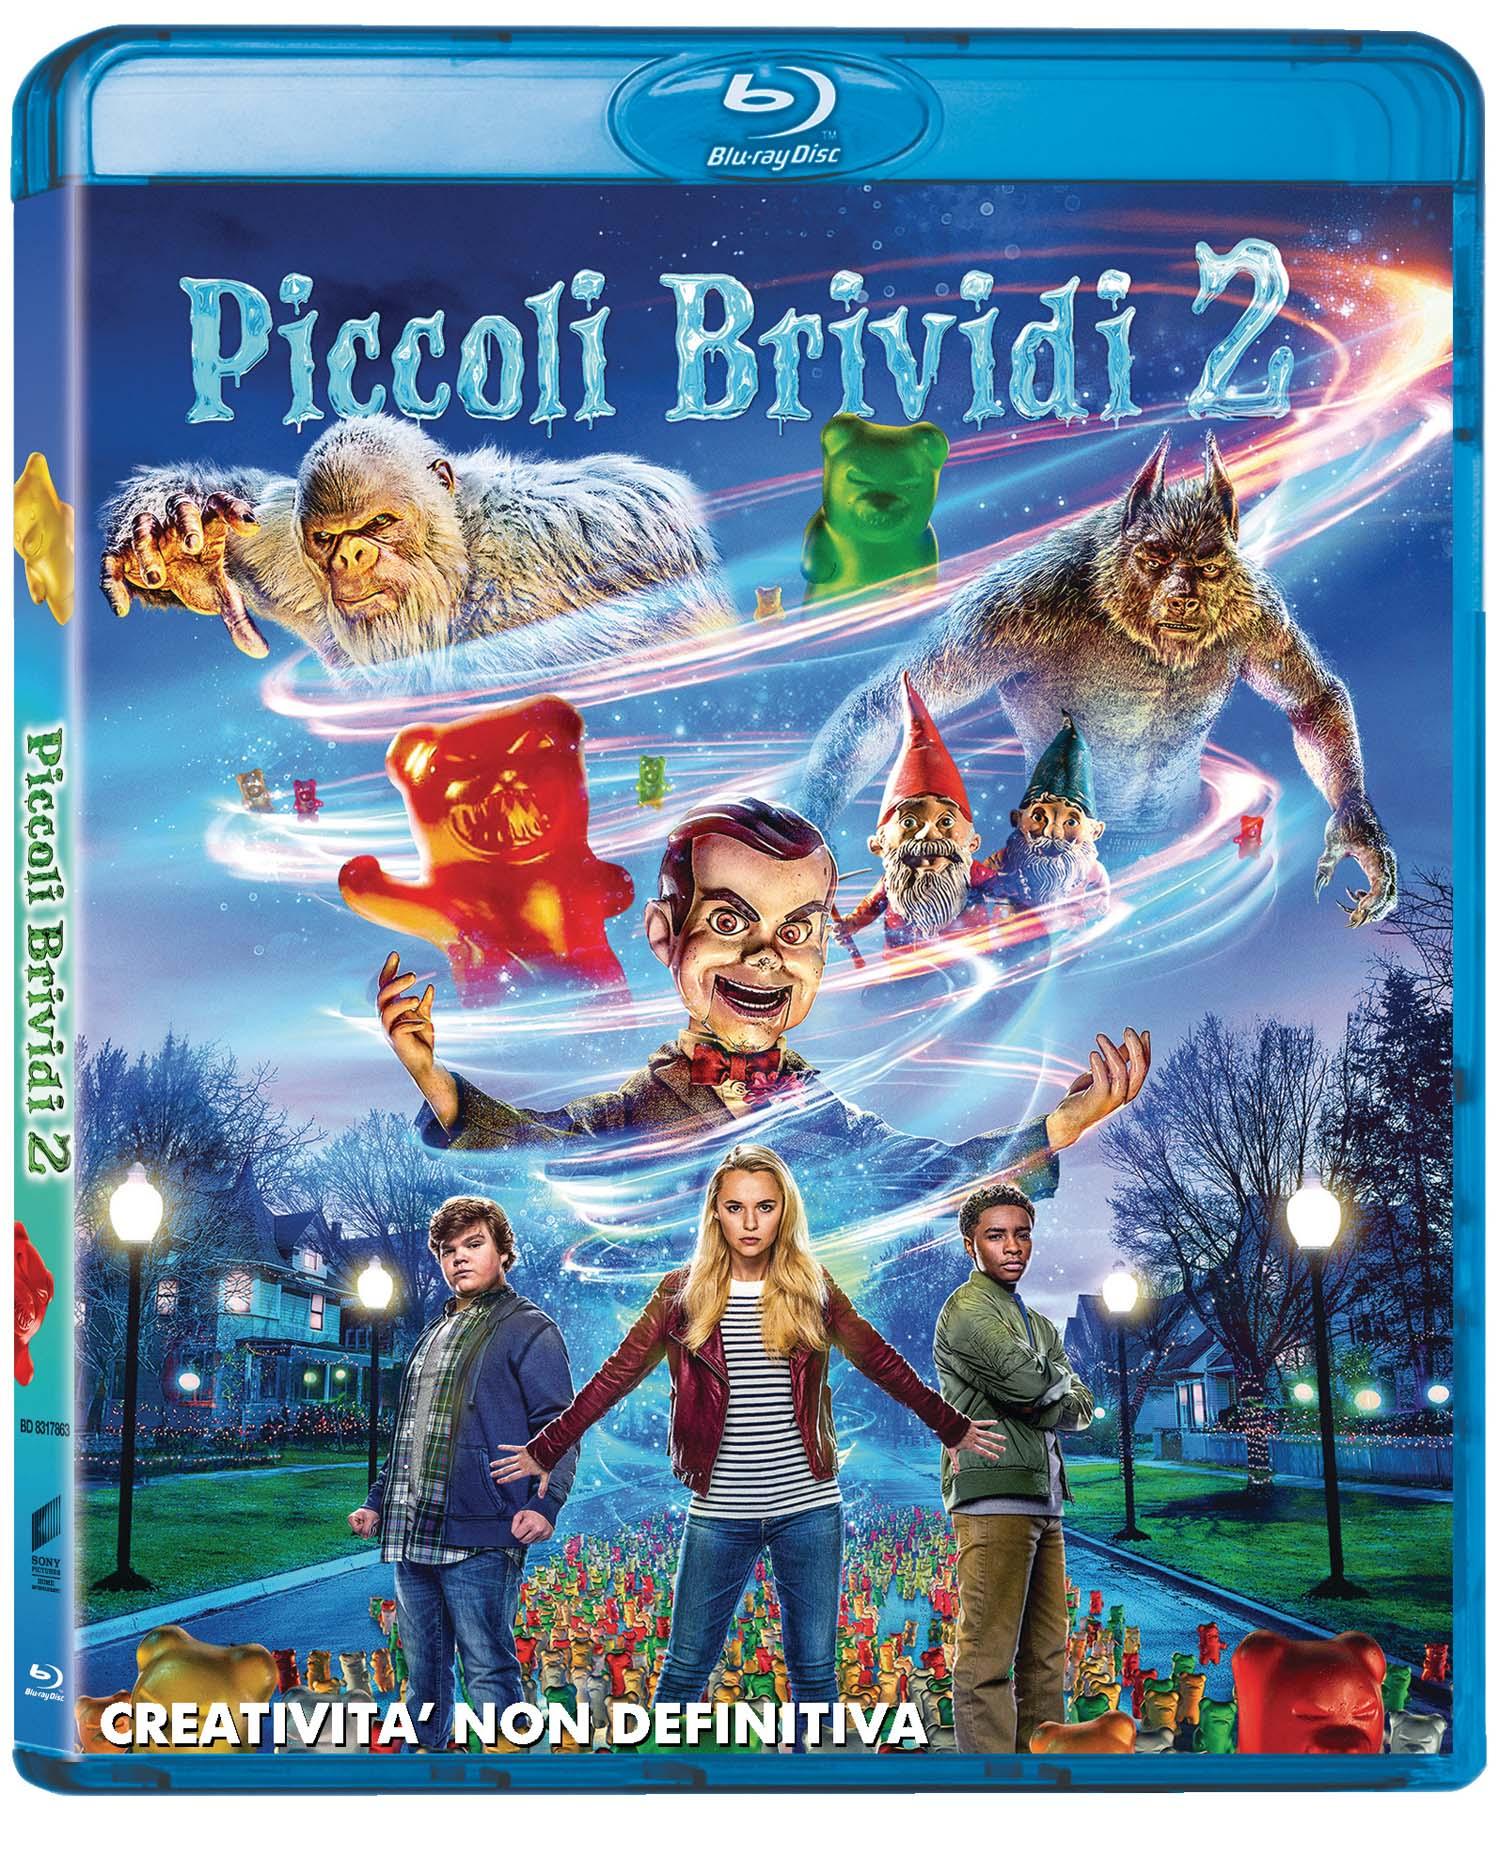 PICCOLI BRIVIDI 2: I FANTASMI DI HALLOWEEN - BLU RAY